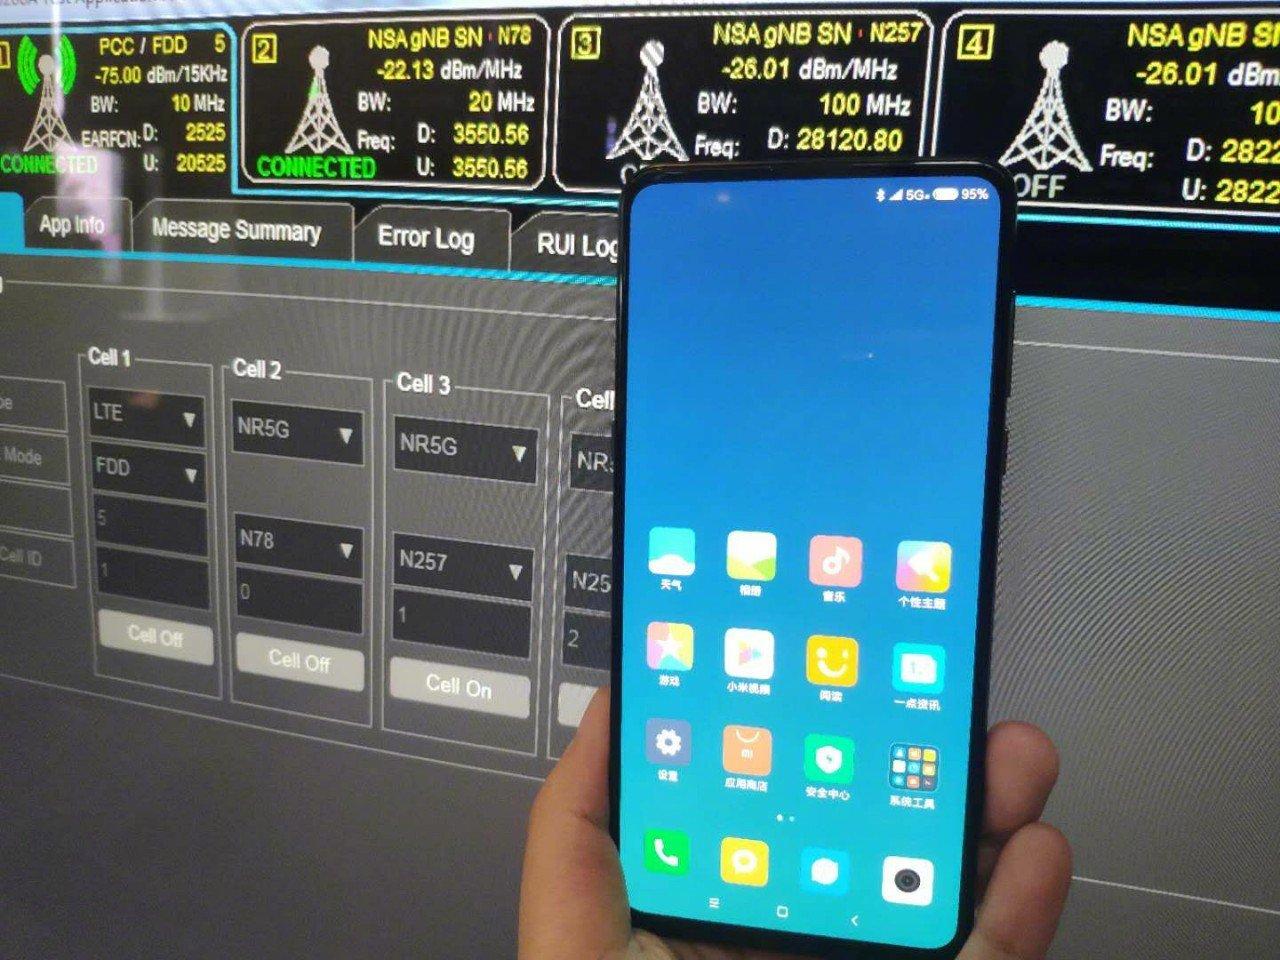 xiaomi mi mix 3, Xiaomi, first 5g smartphone, 5G, Gadgets News